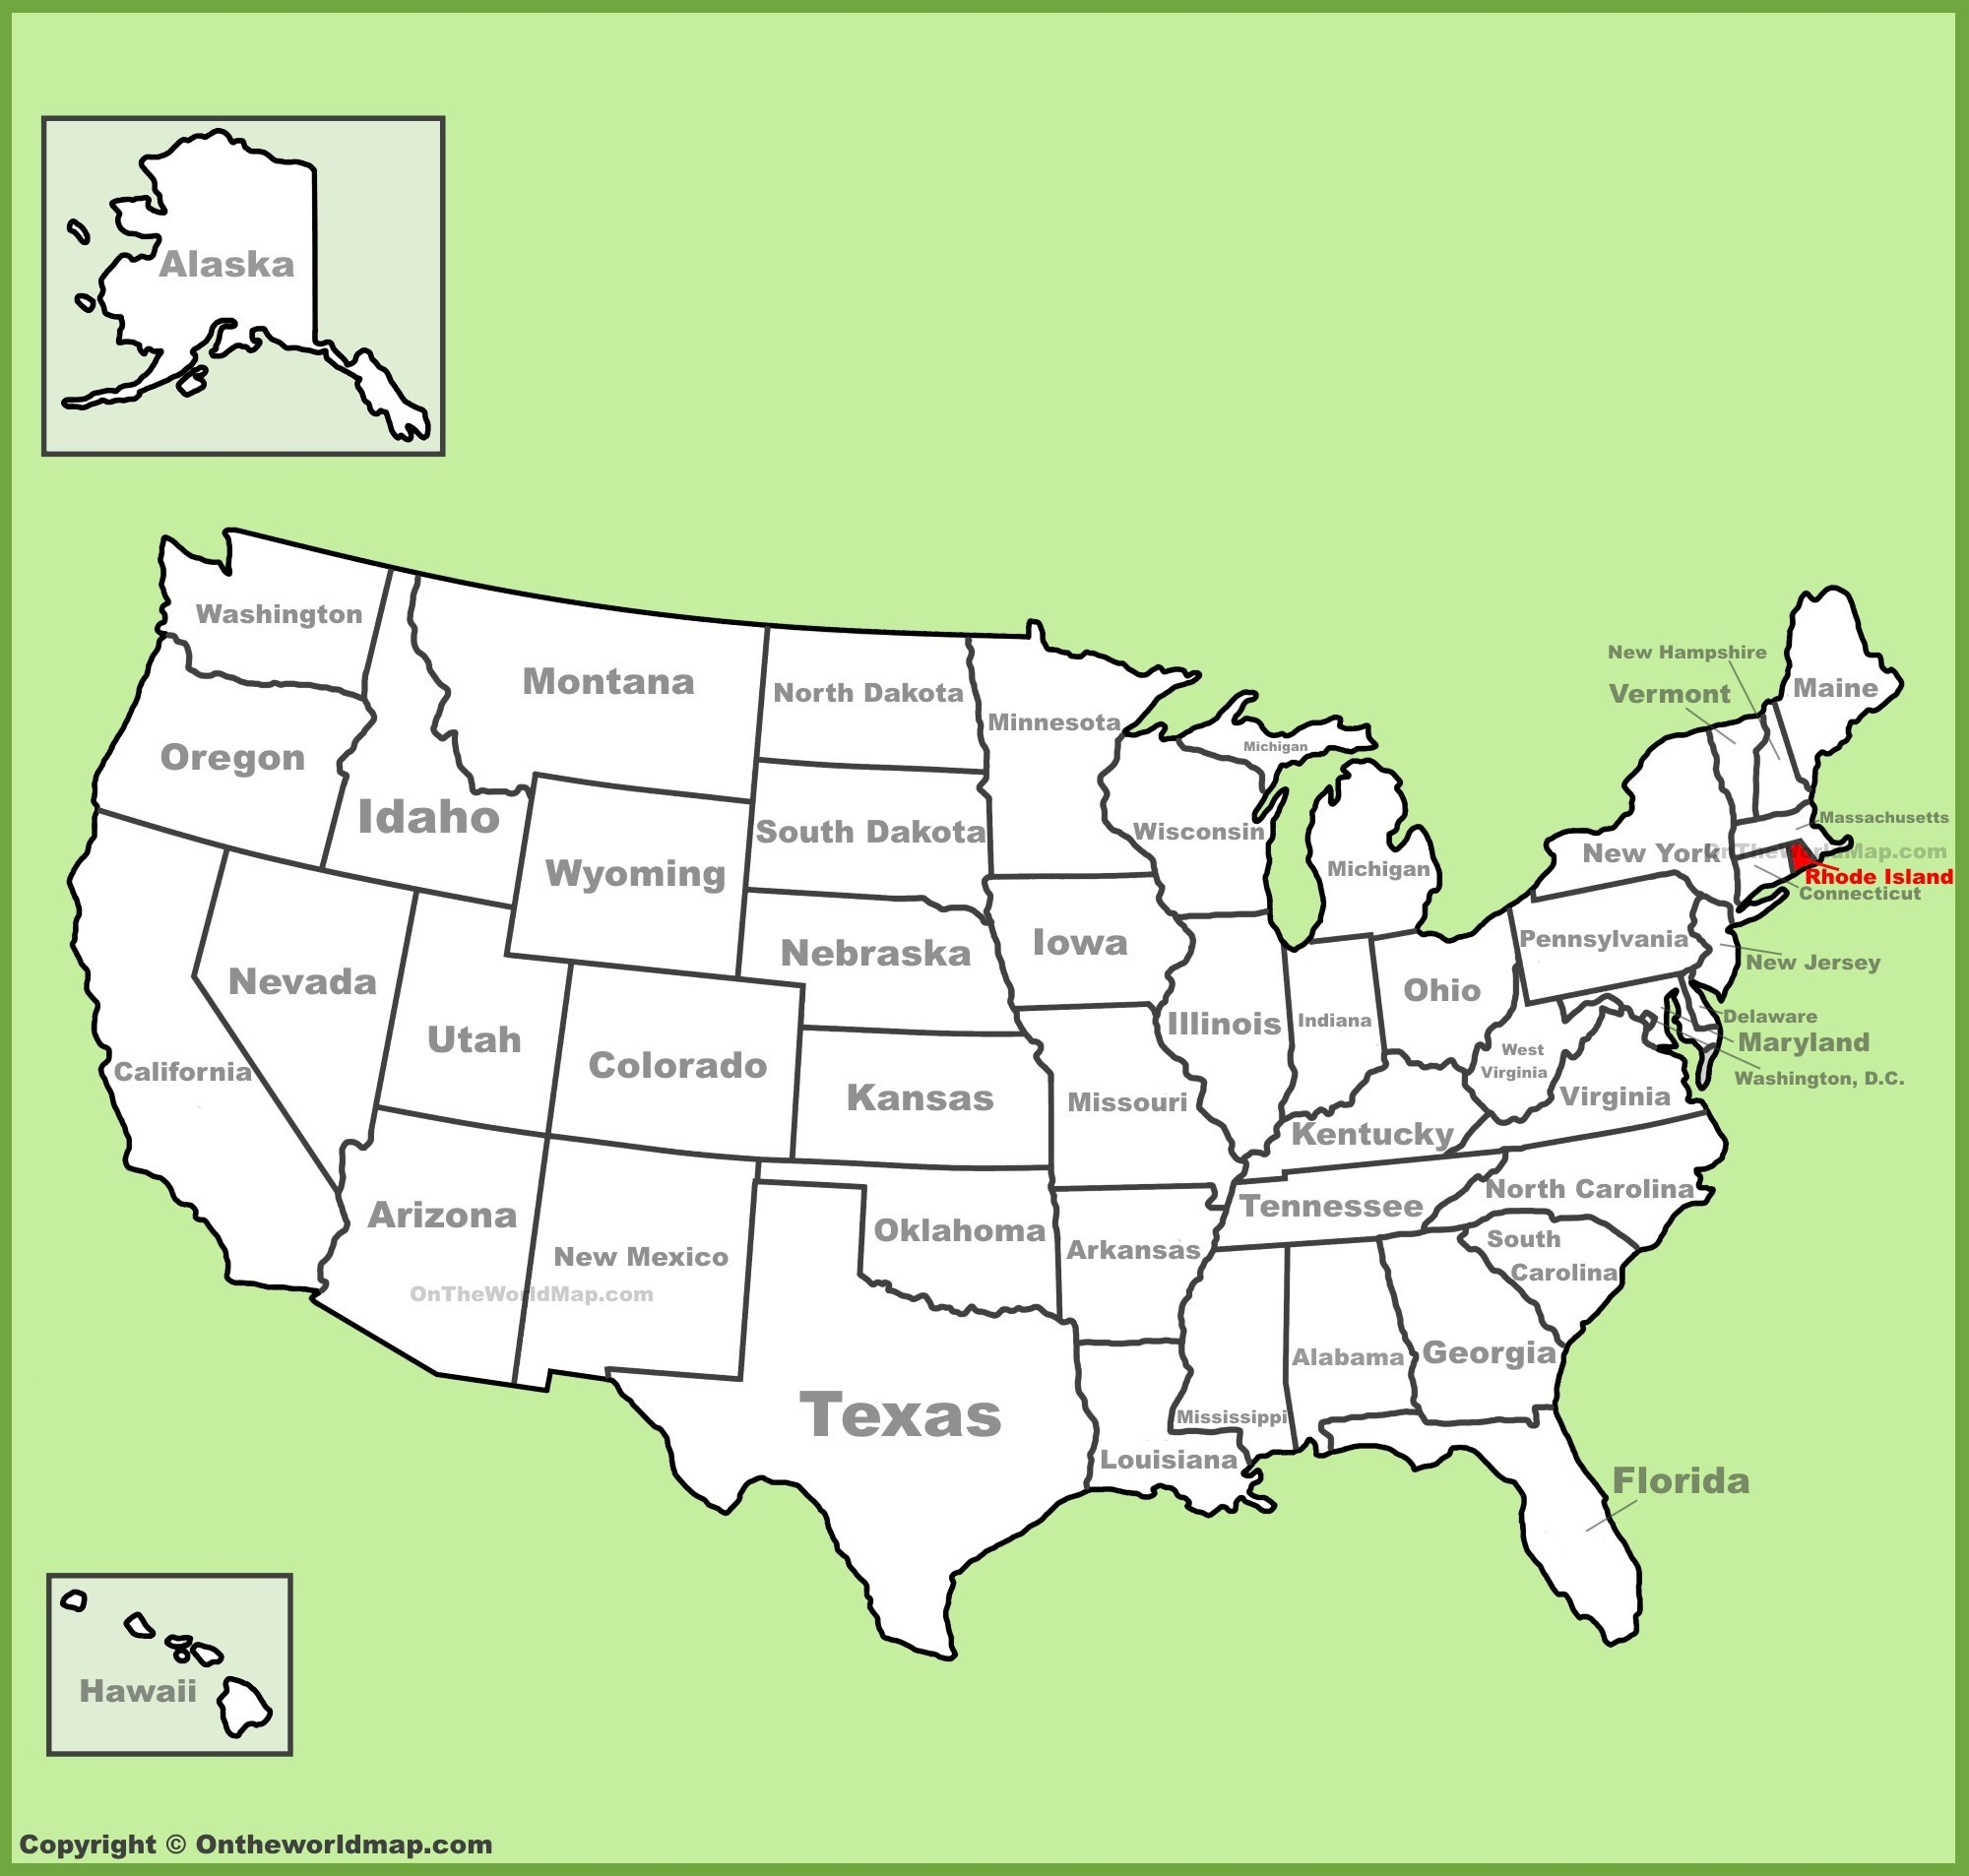 United States Map Great Salt Lake Fresh Salt Lake City Us Map - Map Of Lake City Florida And Surrounding Area